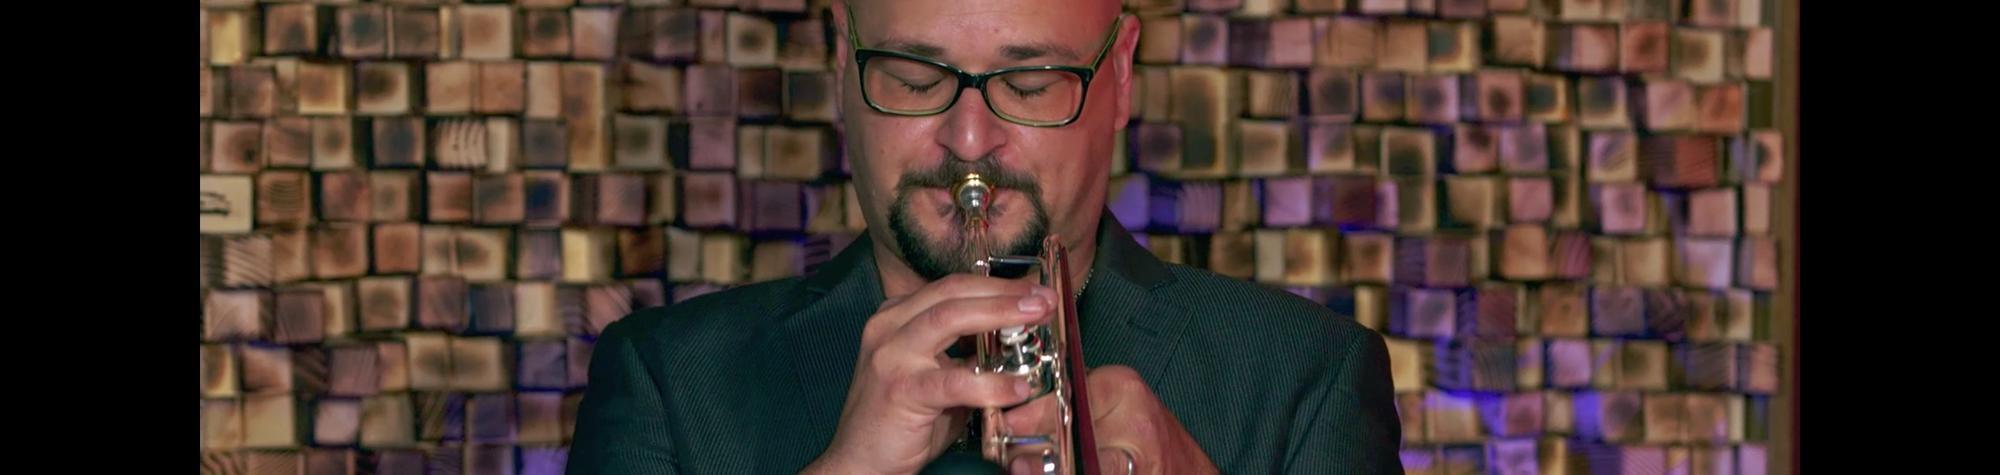 INTRODUCING The Dan Rosenboom Signature Model Trumpet Mouthpiece